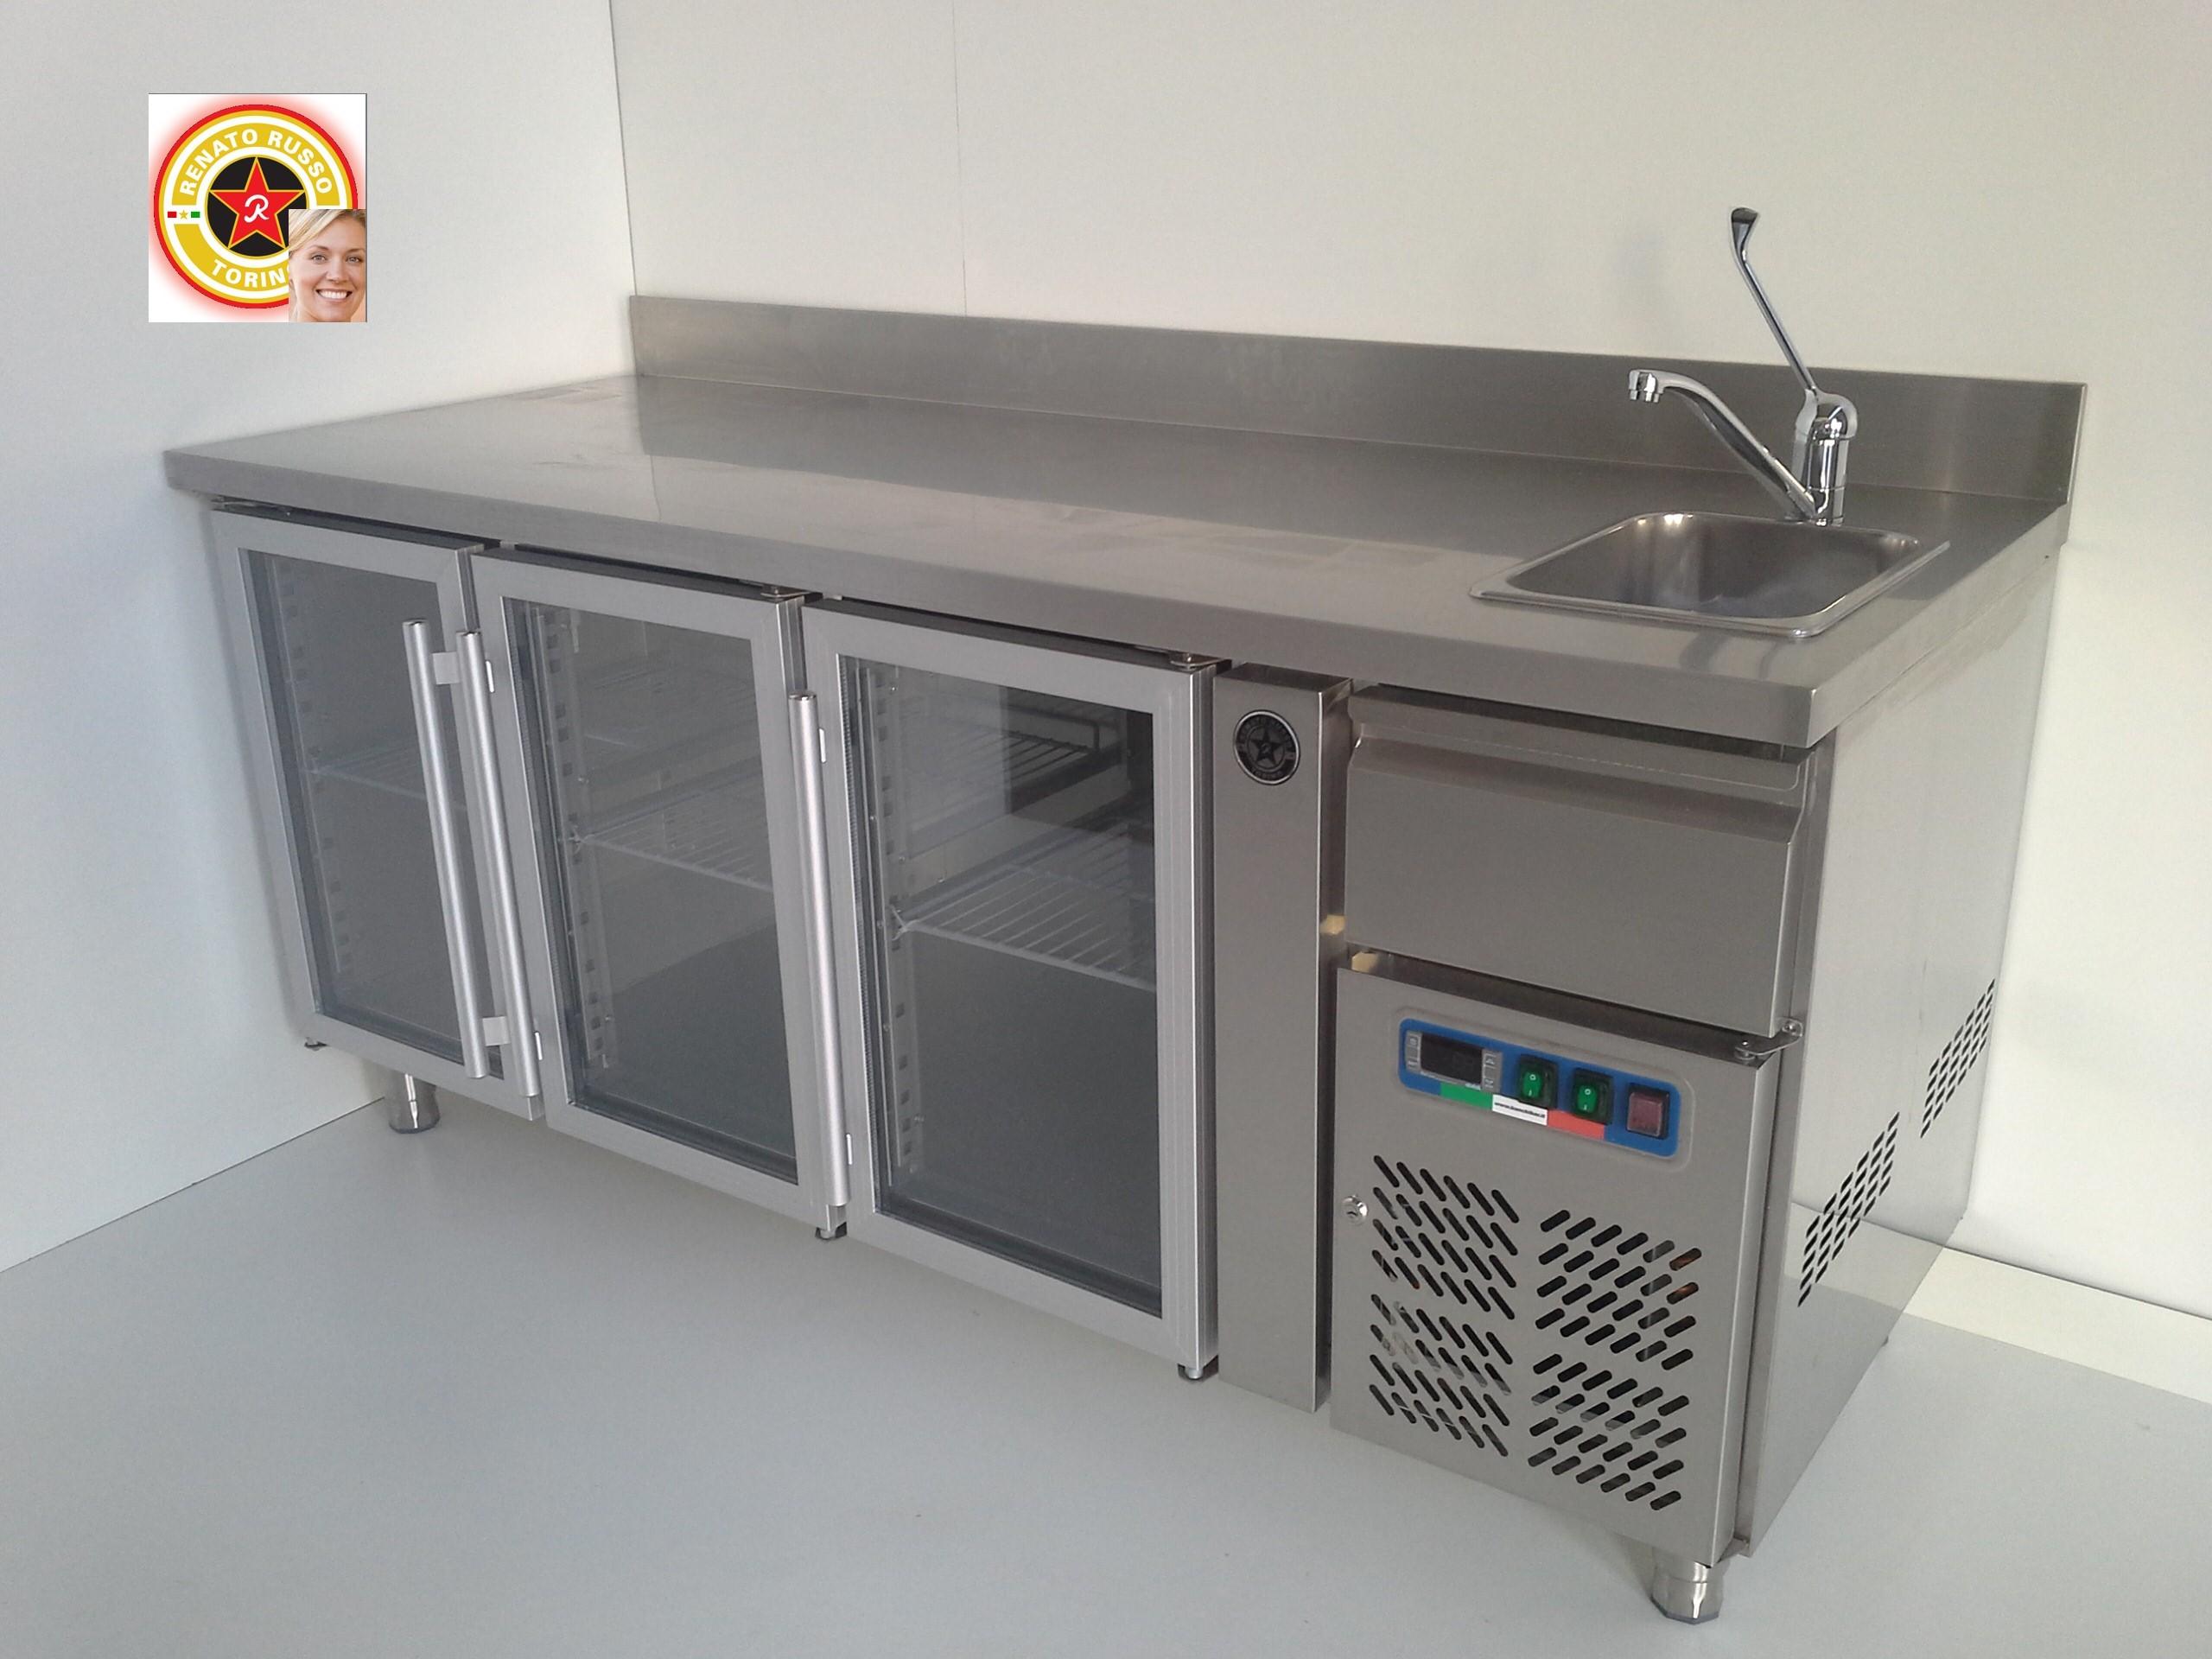 Banchi frigo dal 1980 produttori di banchi frigo workstation per cocktail tavoli refrigerati - Frigo da tavolo usato ...